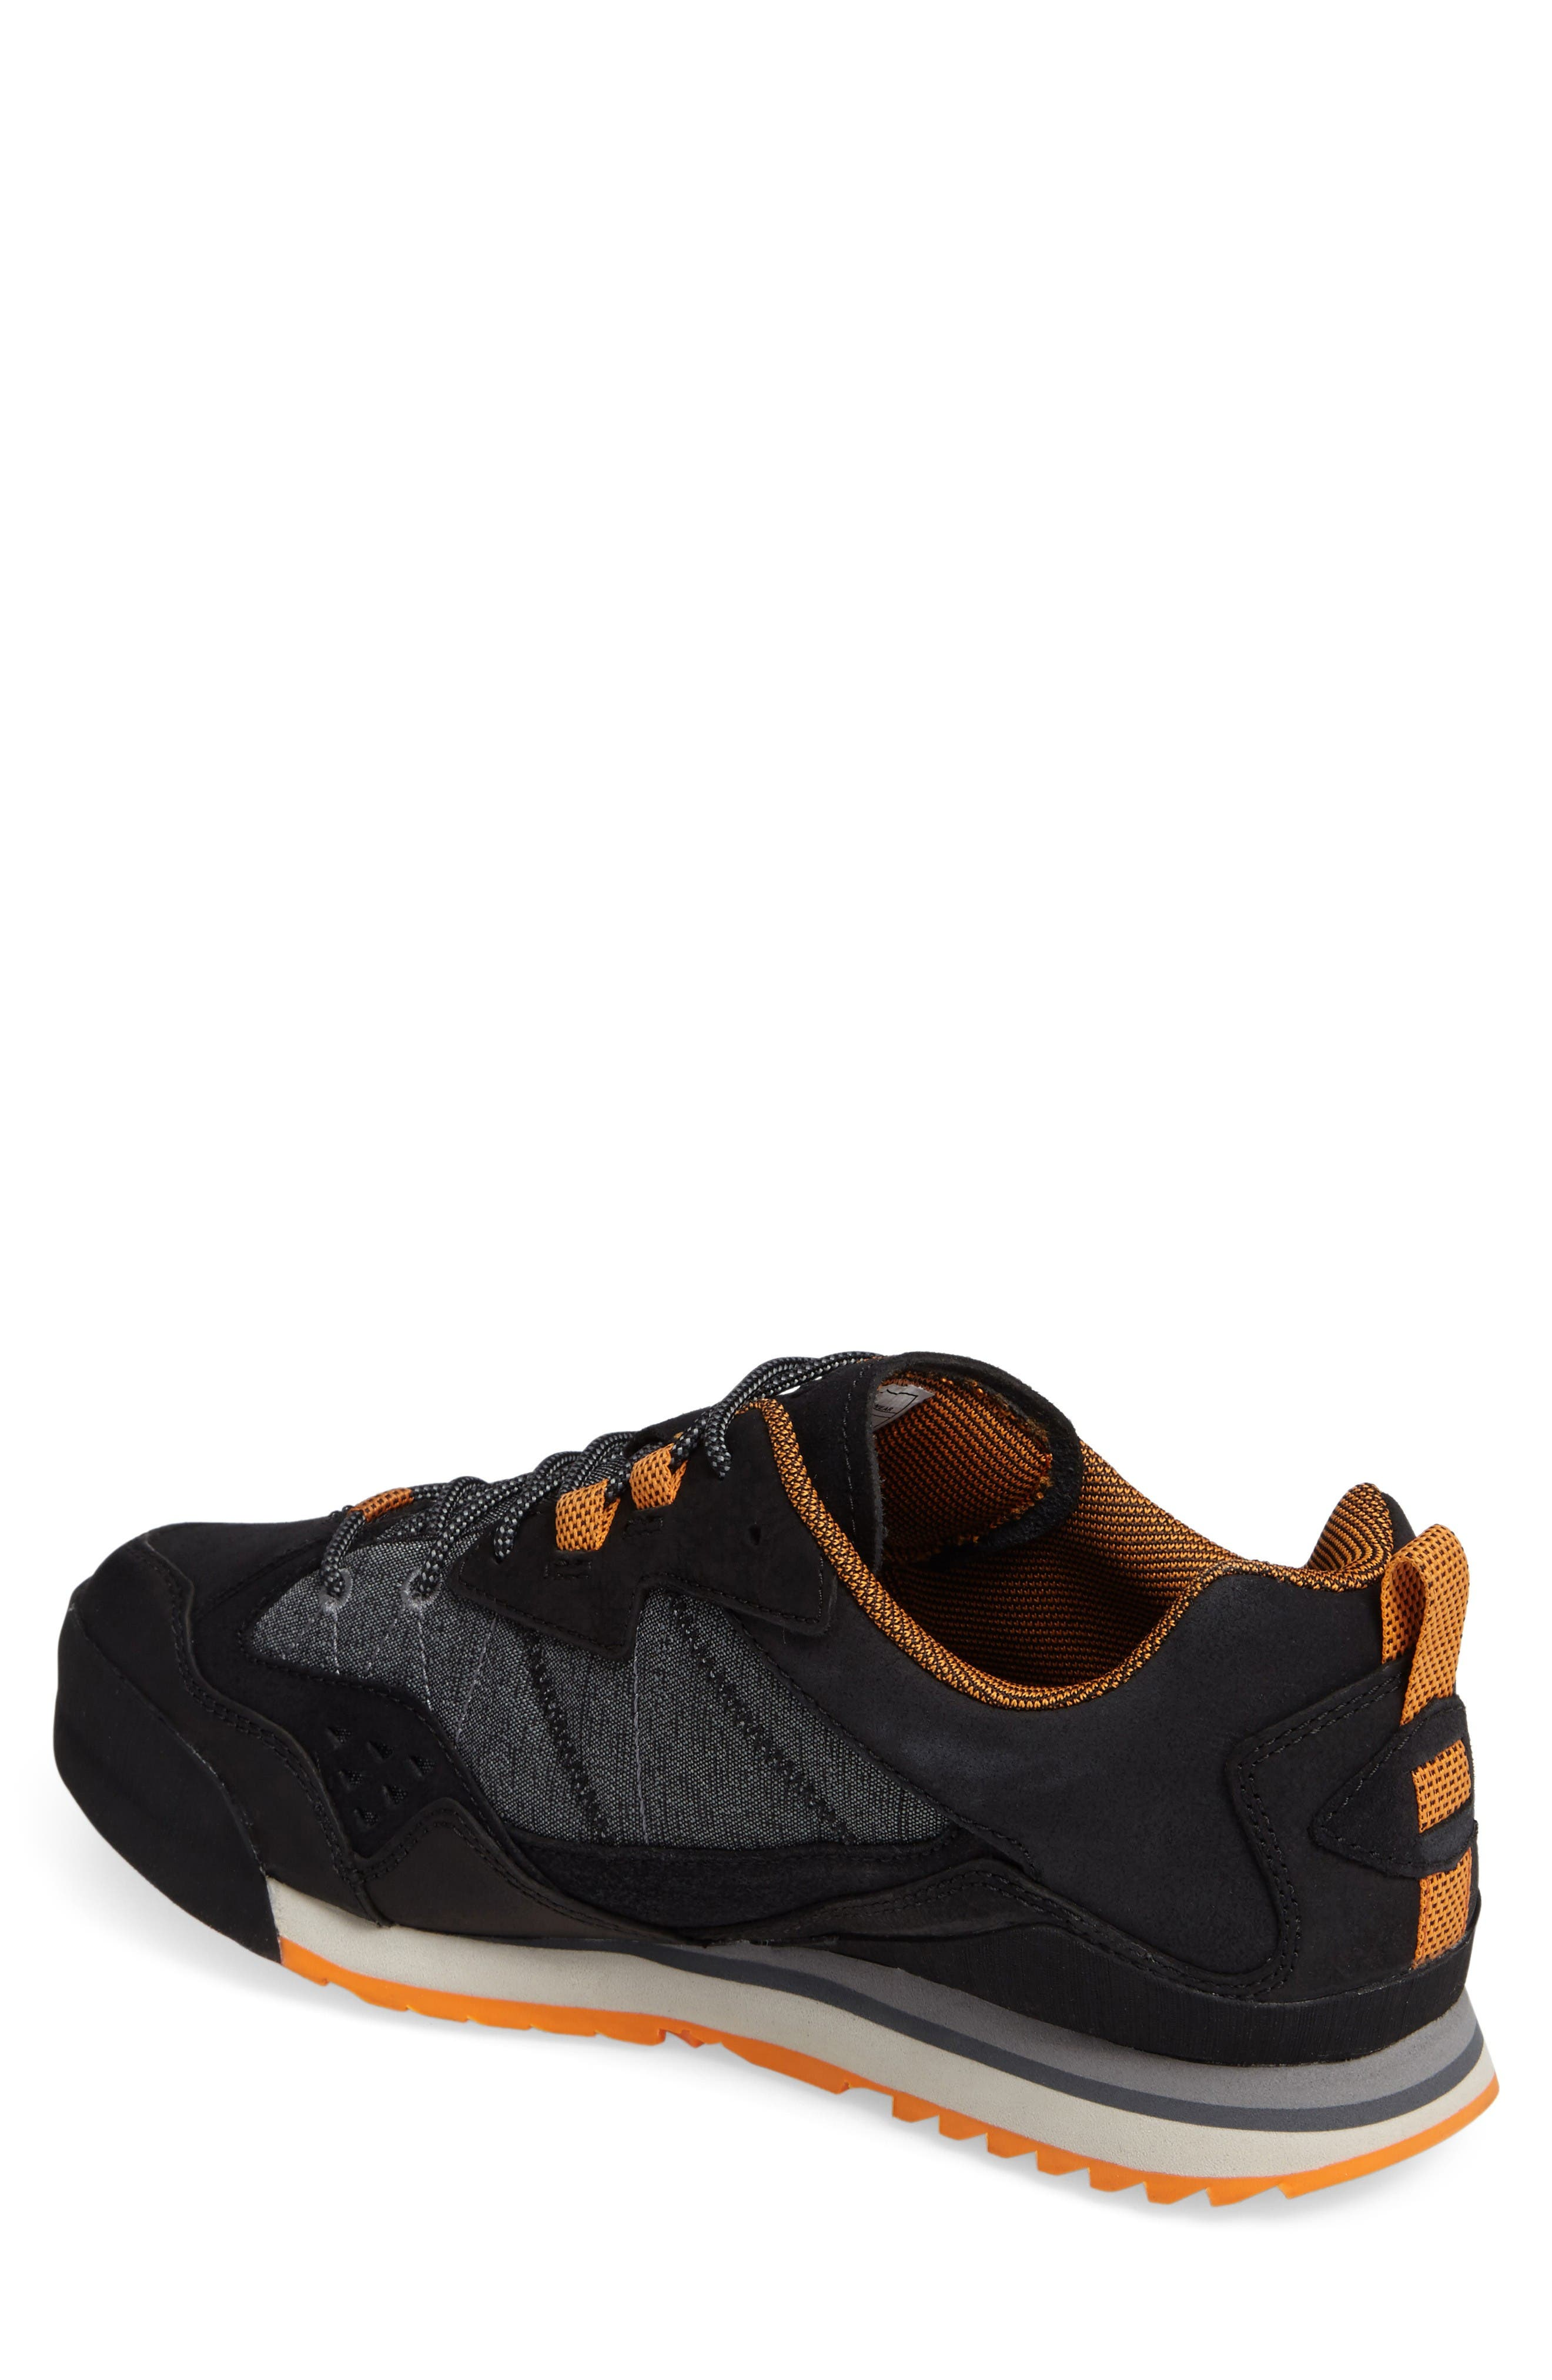 Burnt Rock Sneaker,                             Alternate thumbnail 2, color,                             Black